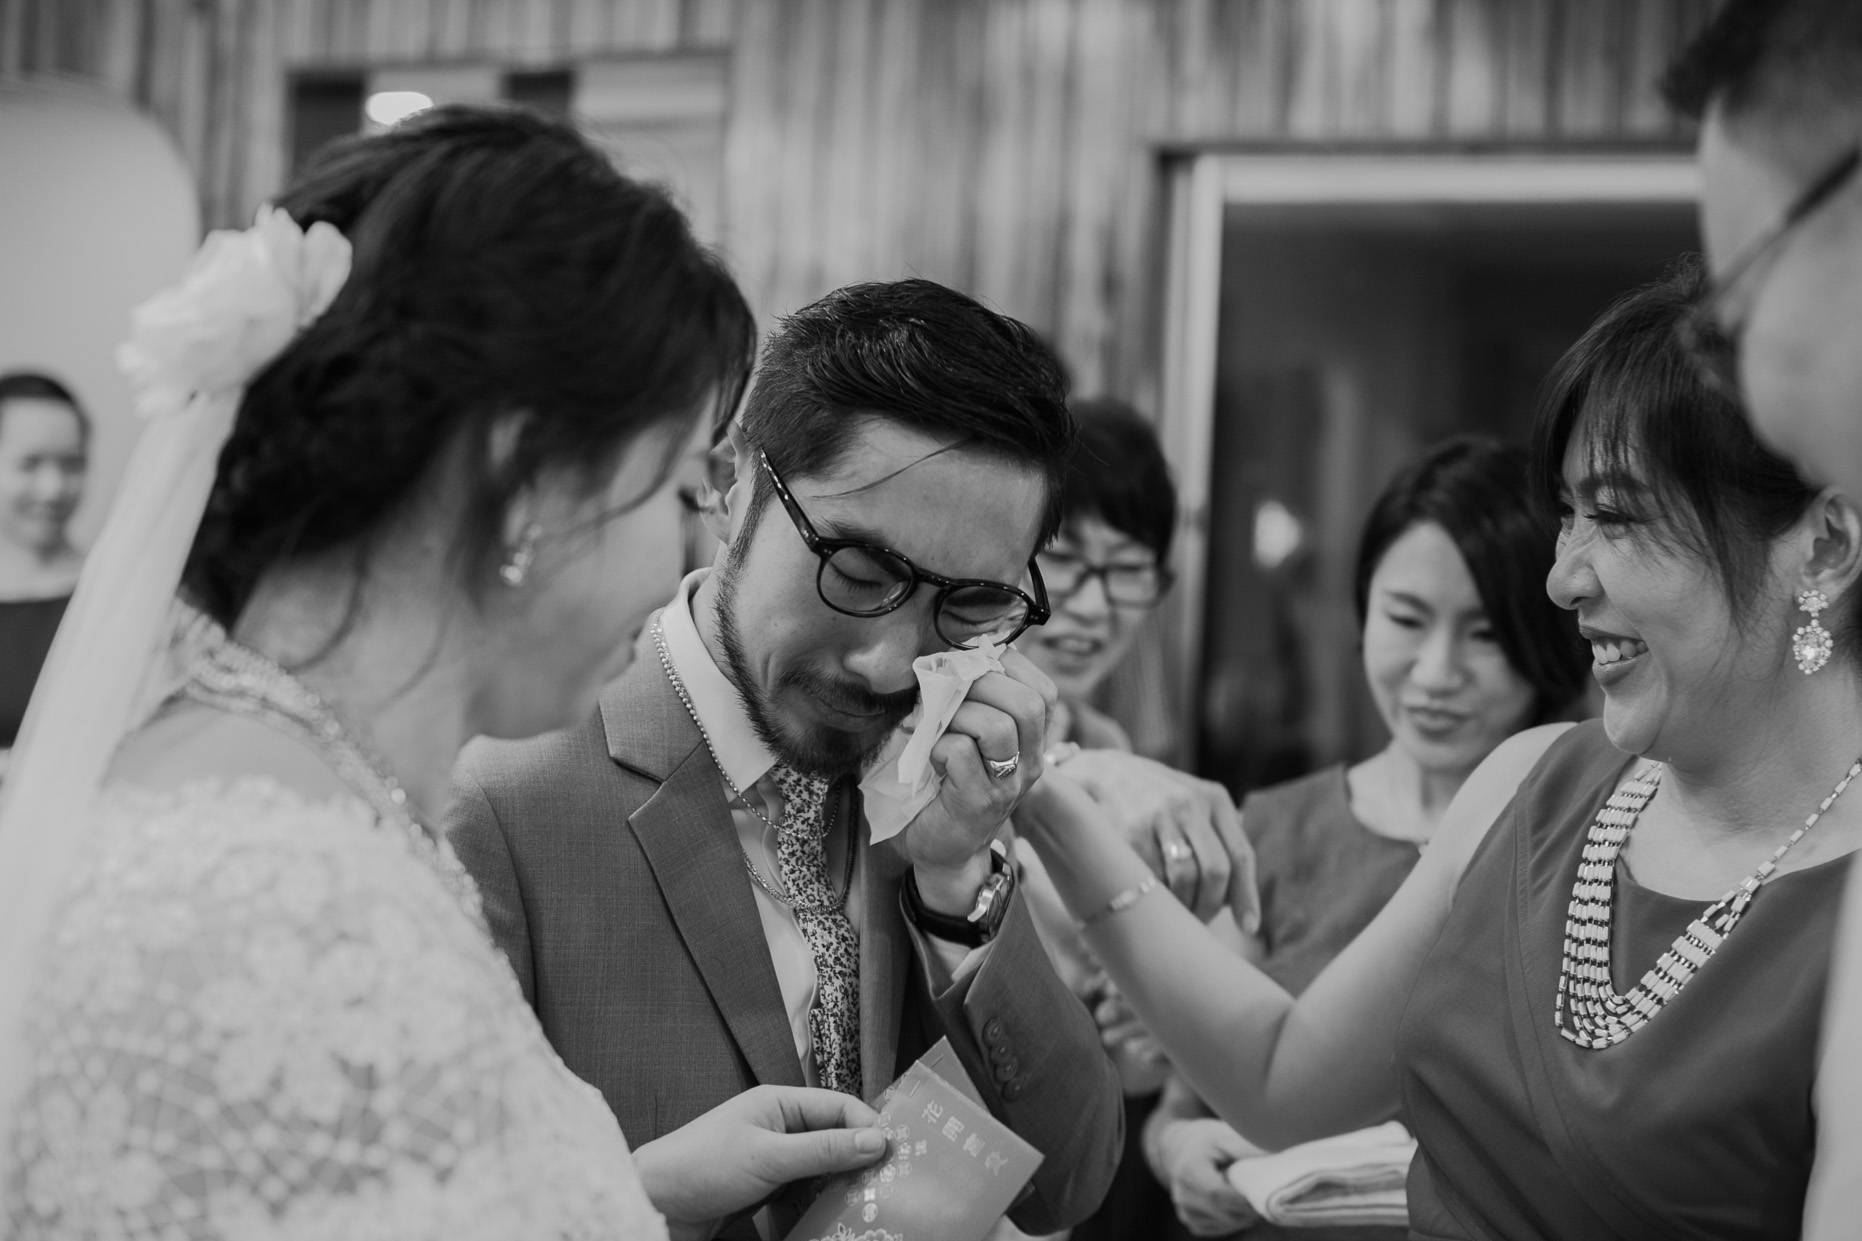 33-hellojanelee-sam grace-malaysia-wedding-day